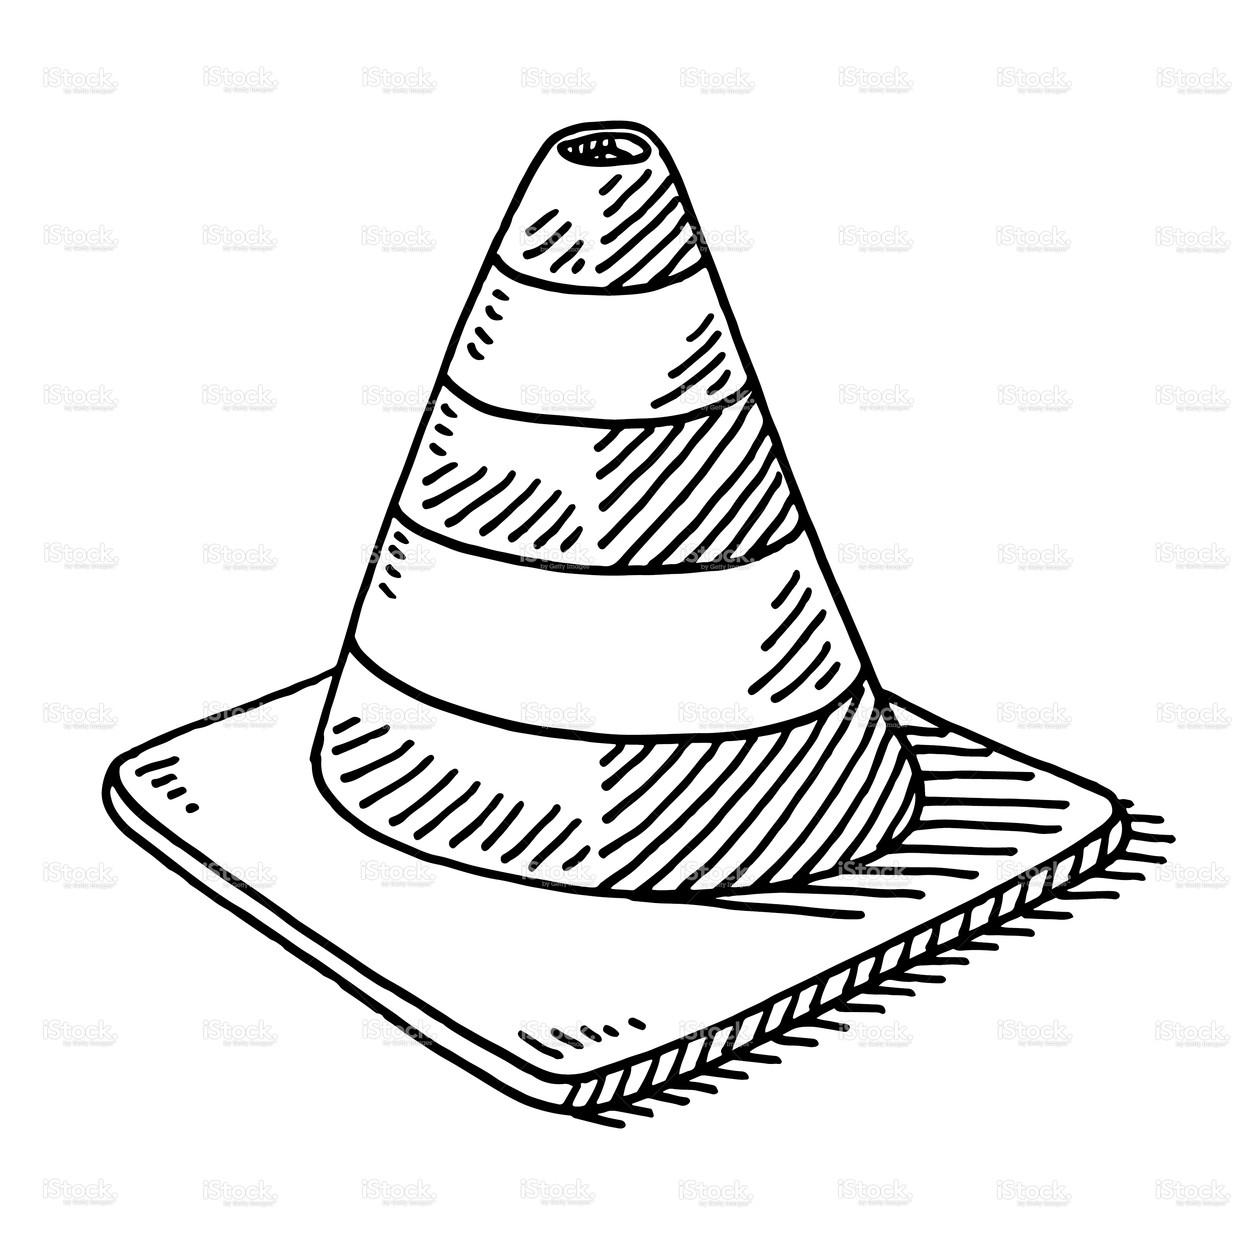 1235x1235 Stock Illustration Traffic Cone Drawing